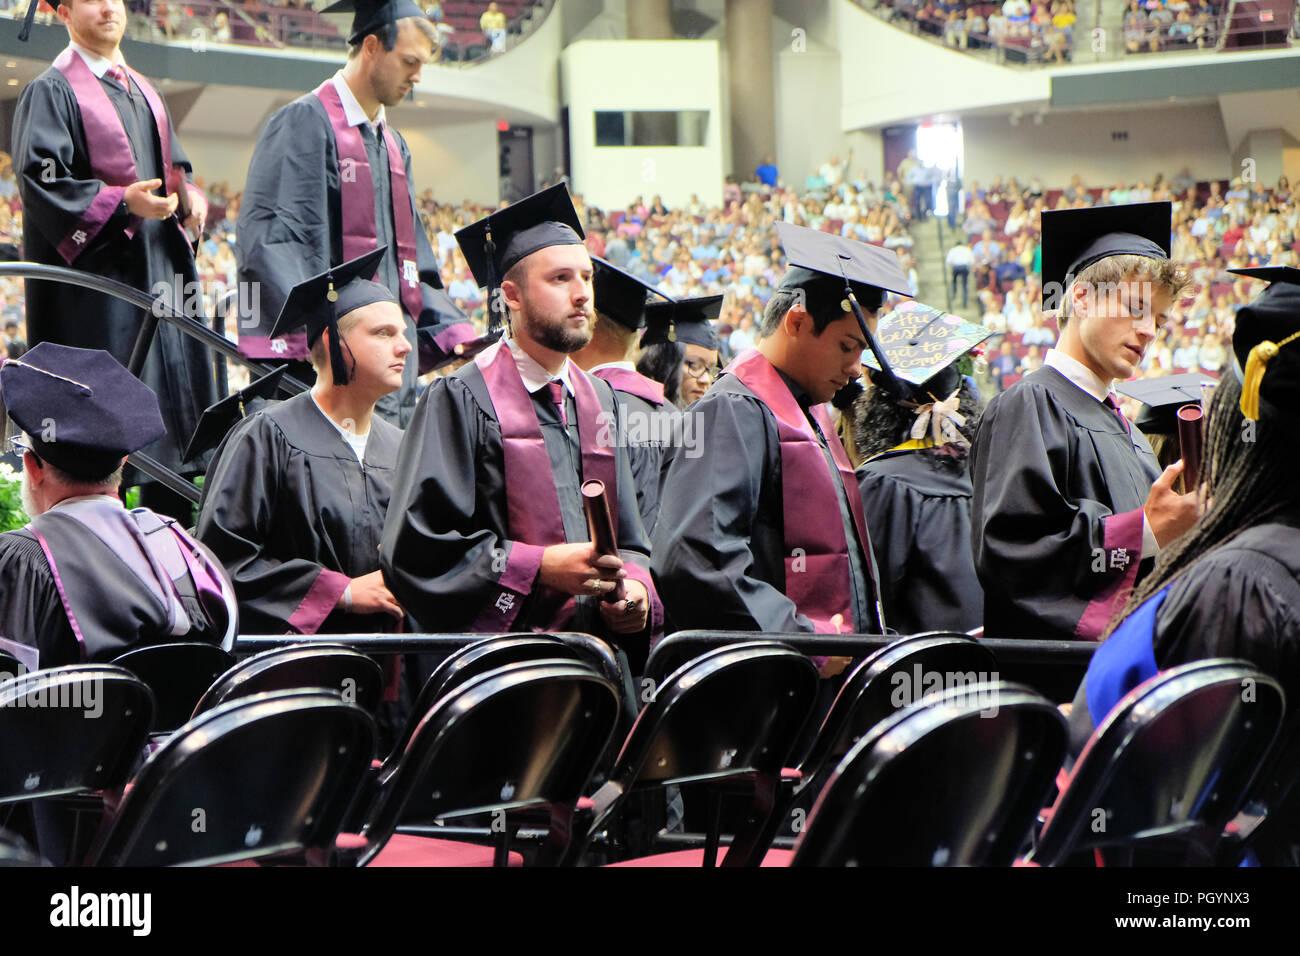 Students at an American university graduation. - Stock Image